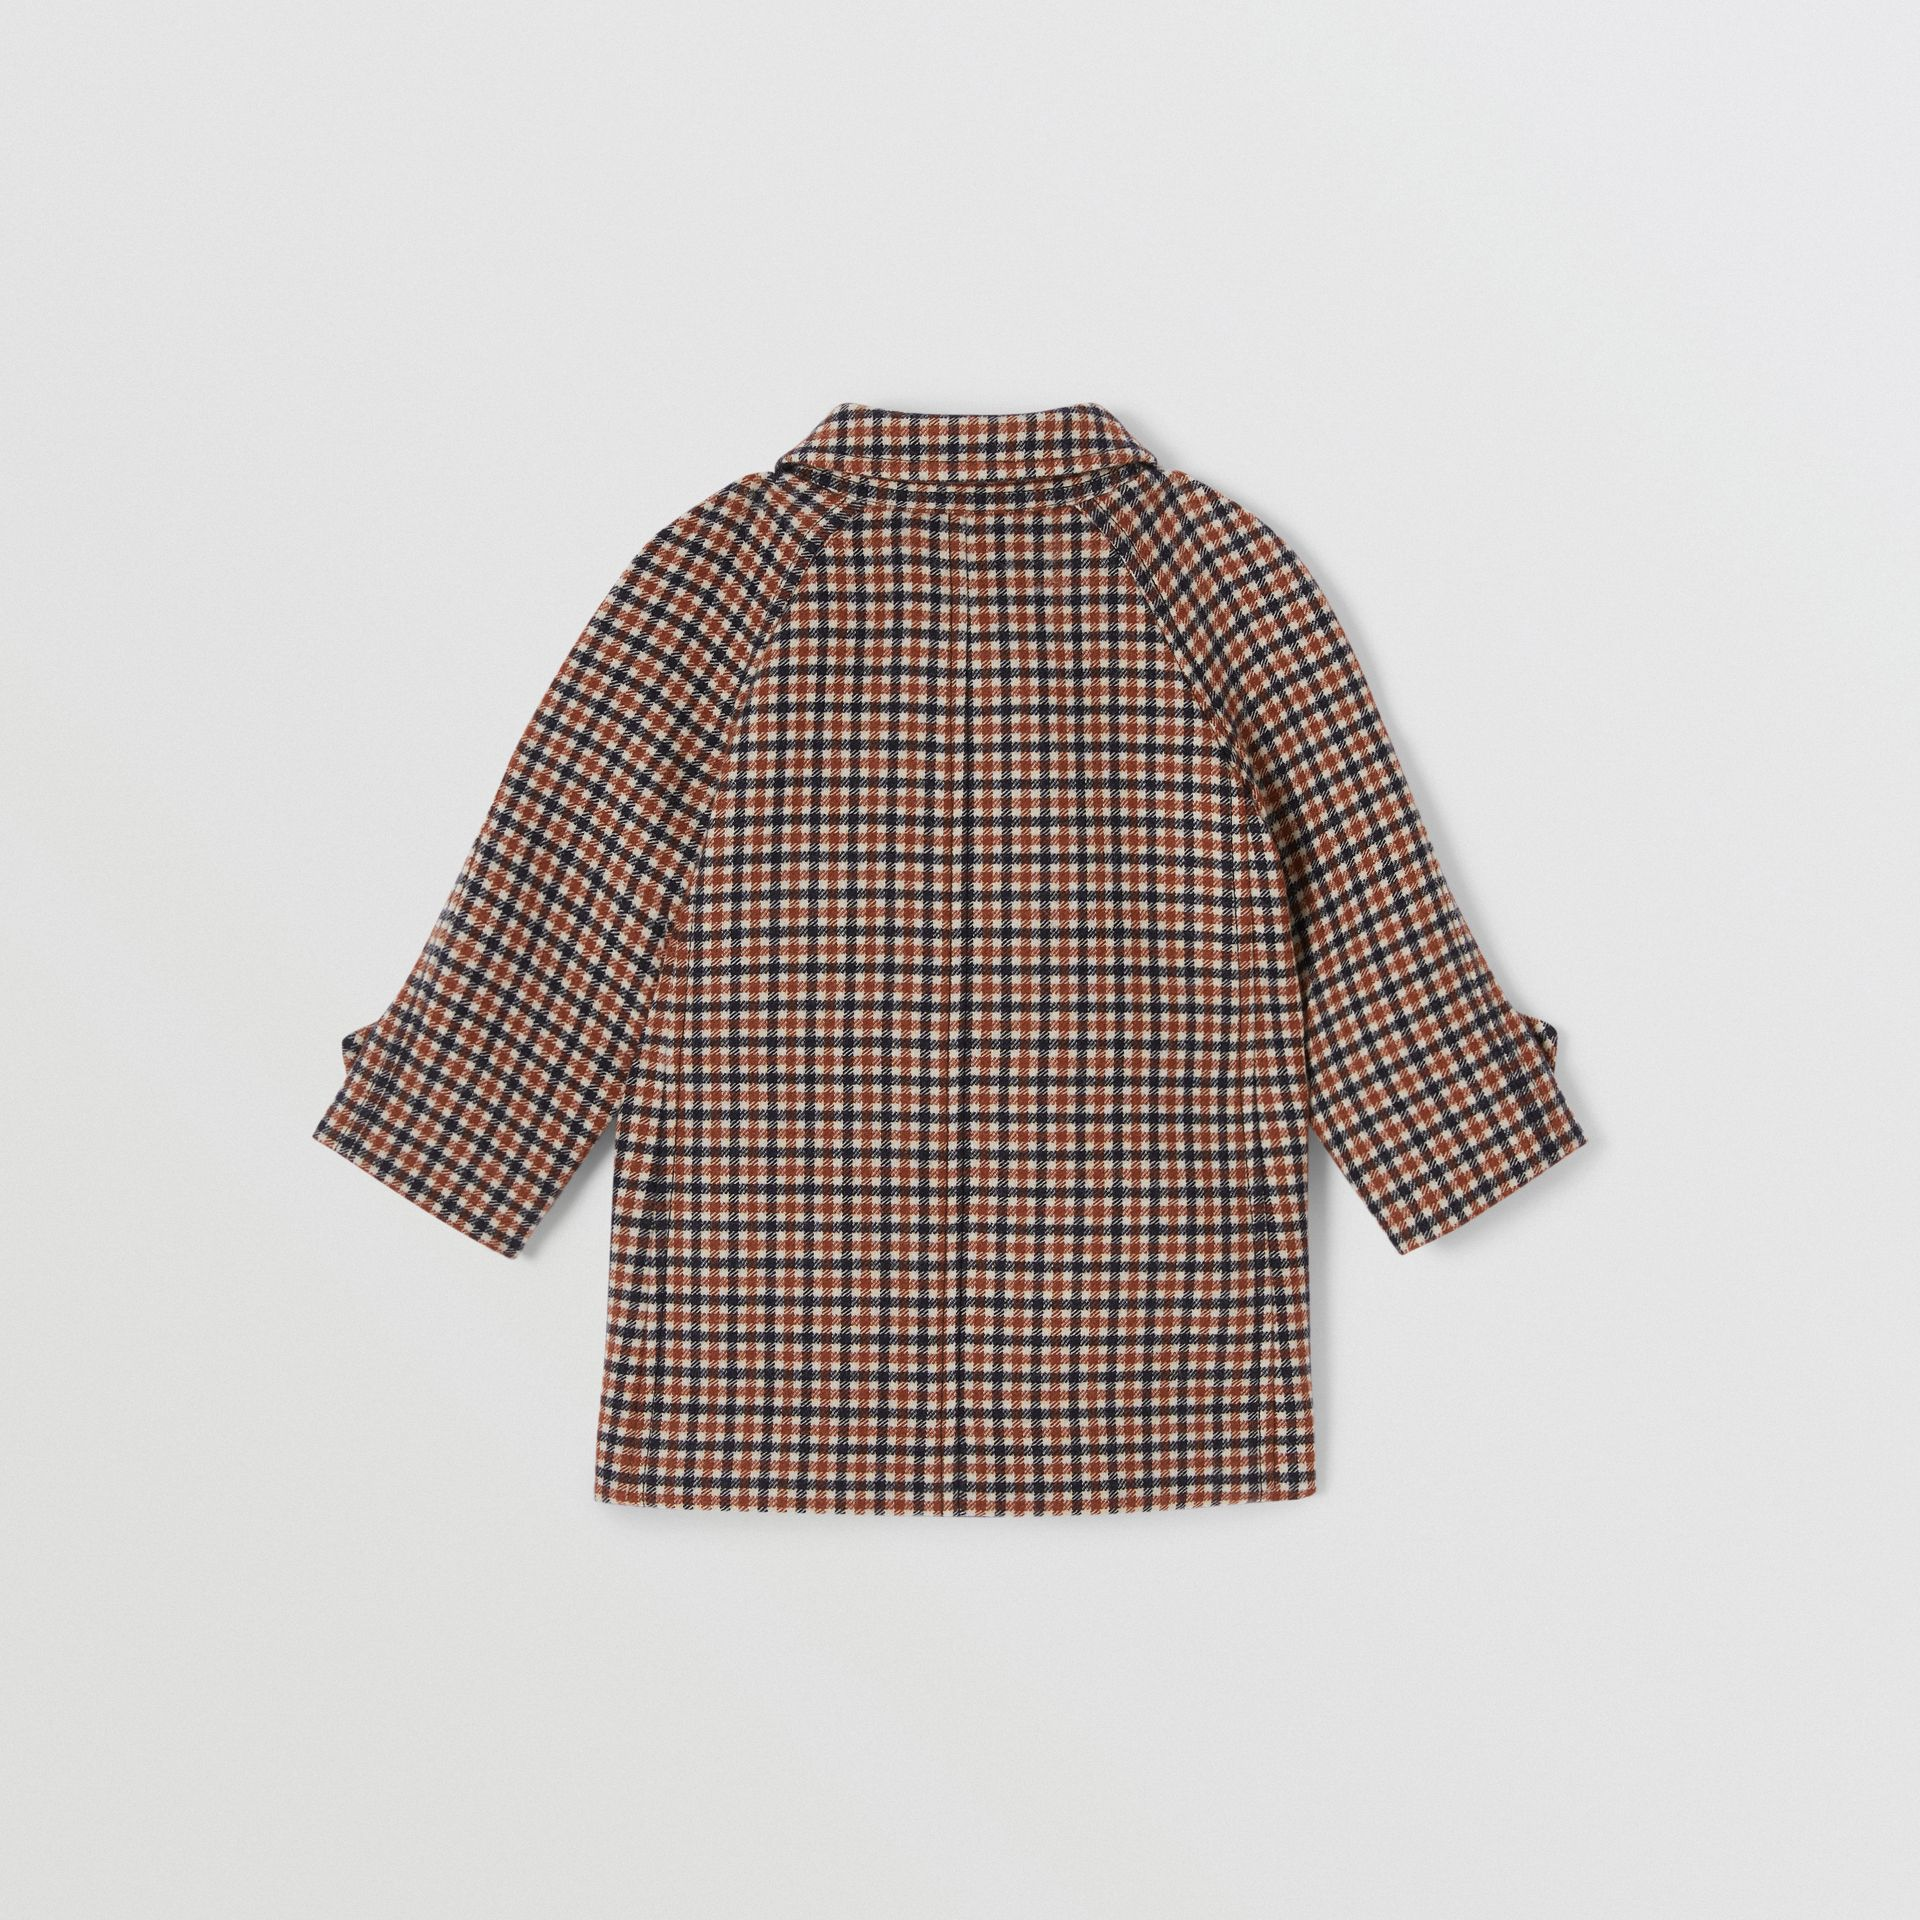 Check Wool Coat in Rust Brown - Children | Burberry - gallery image 3